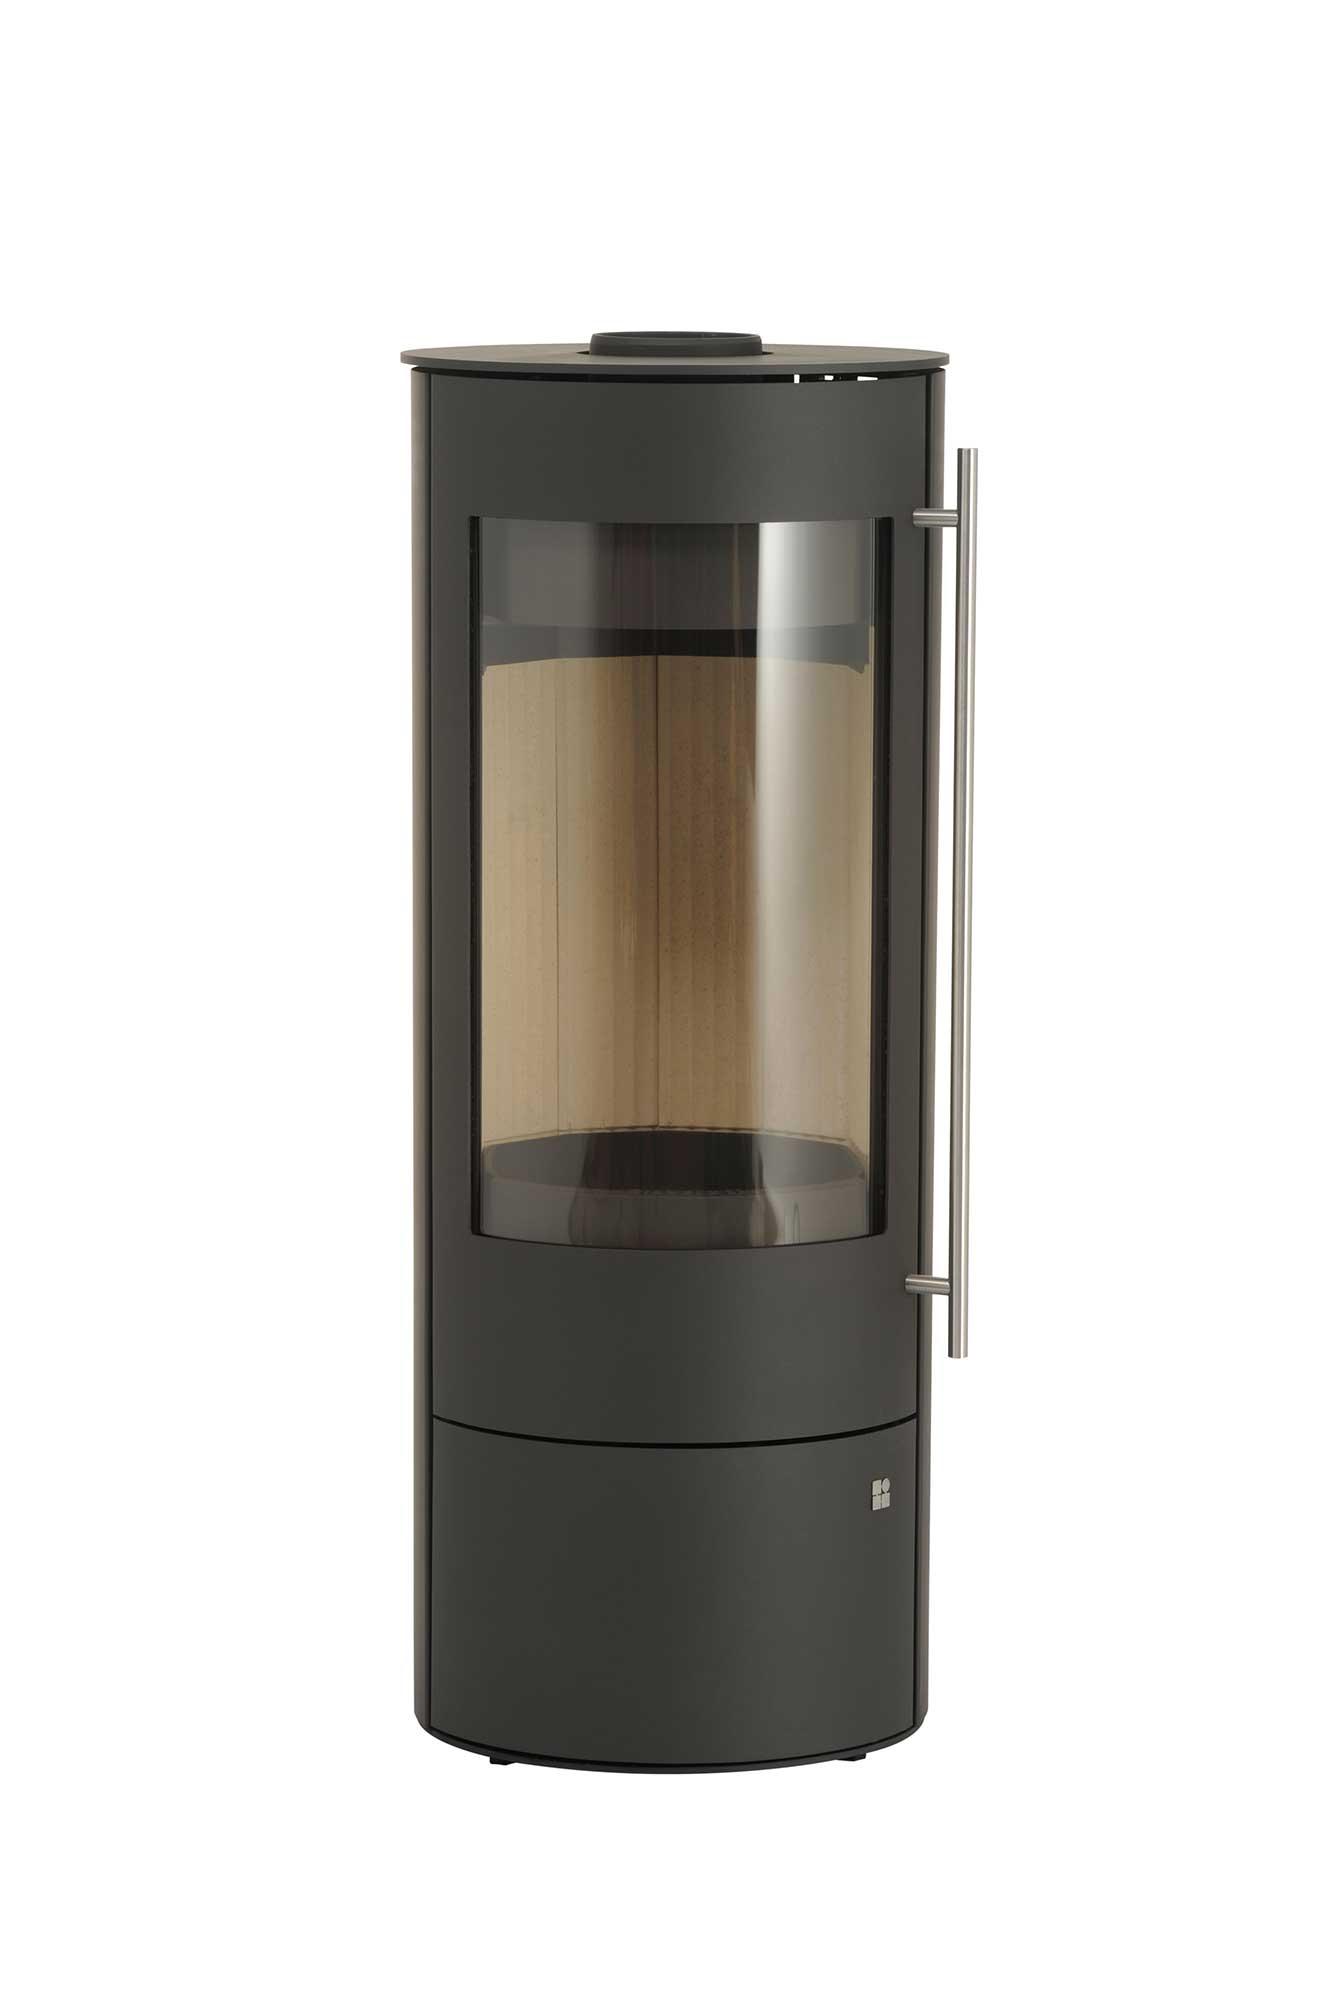 kaminofen olsberg palena compact 5 kw kaufen cafiro. Black Bedroom Furniture Sets. Home Design Ideas